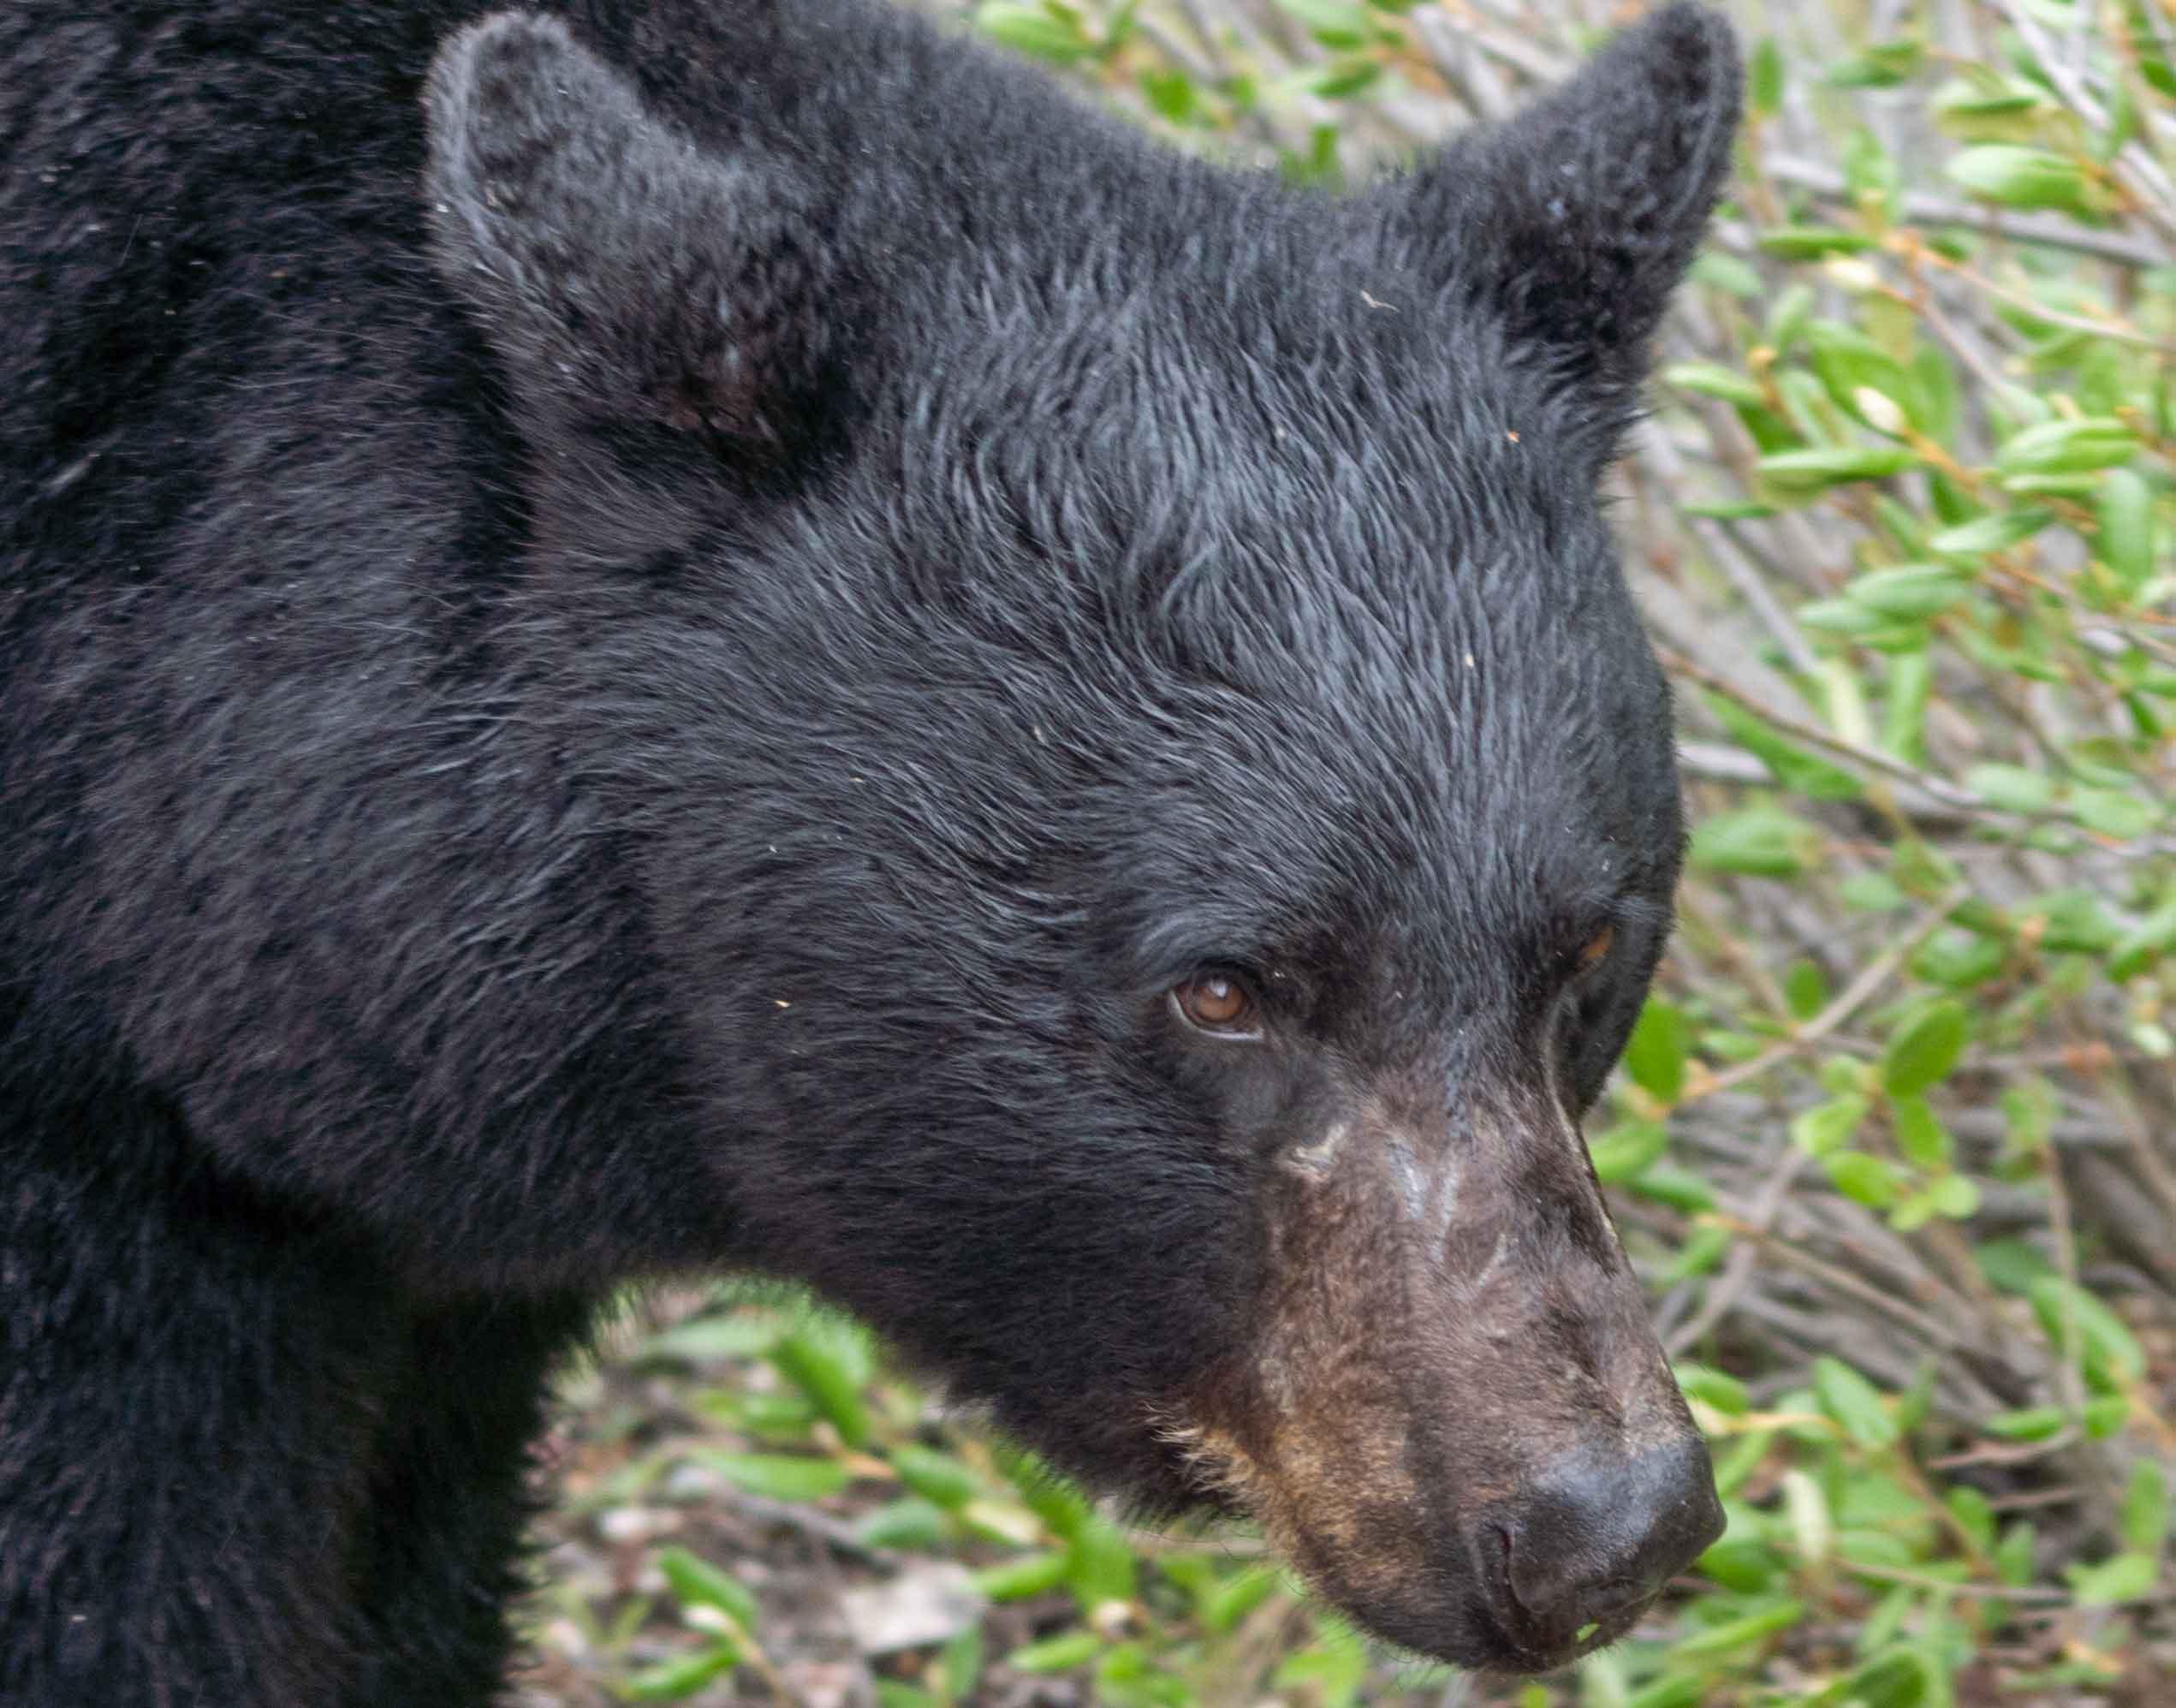 Bear close up by Jack Hawkins